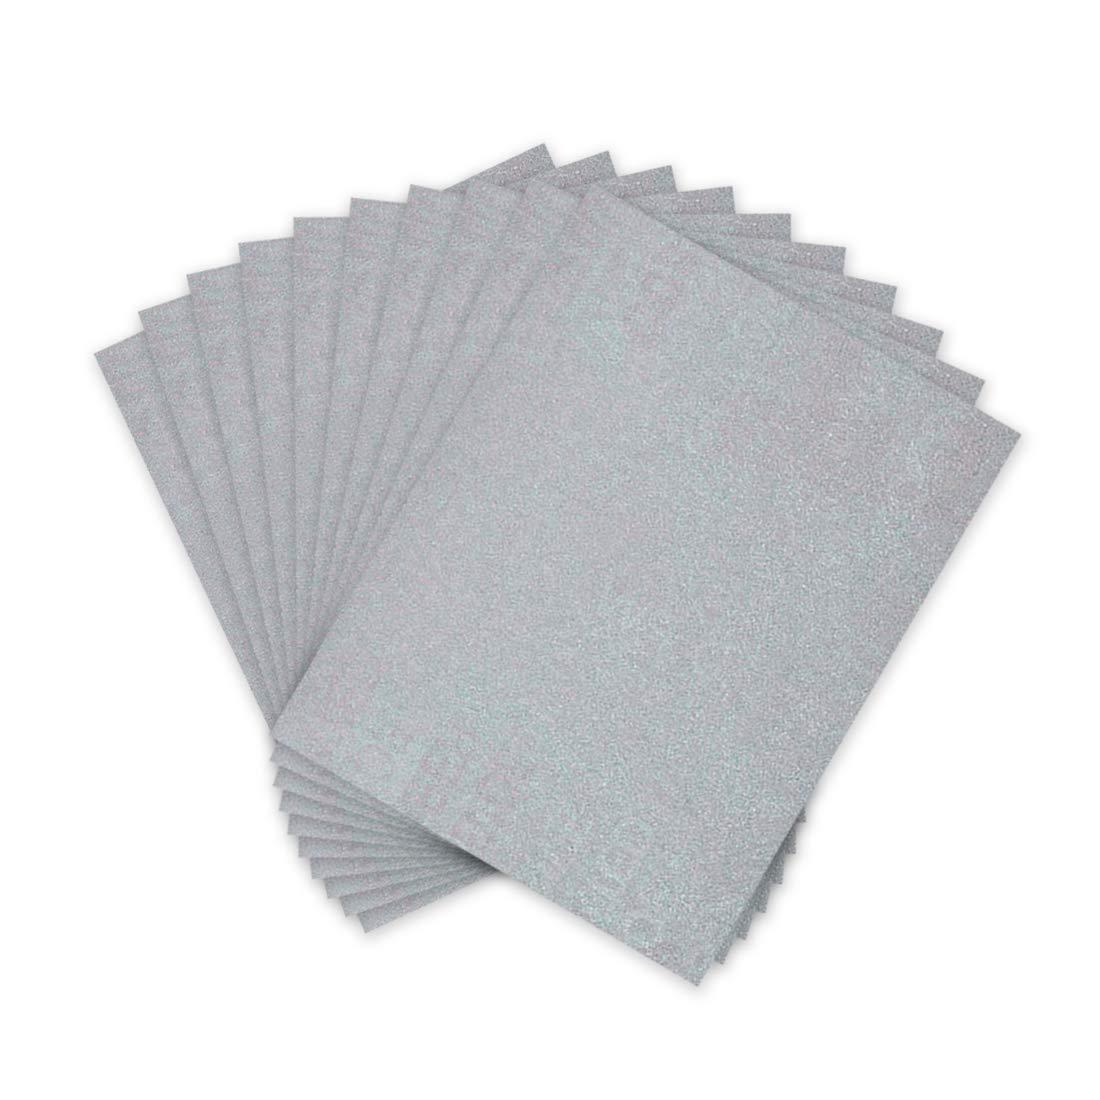 carta abrasiva asciutta Carta abrasiva impermeabile lucidatura automobilistica per finitura mobili in legno 9 x 3,7 cm levigatura metallica Sourcingmap 5 pezzi